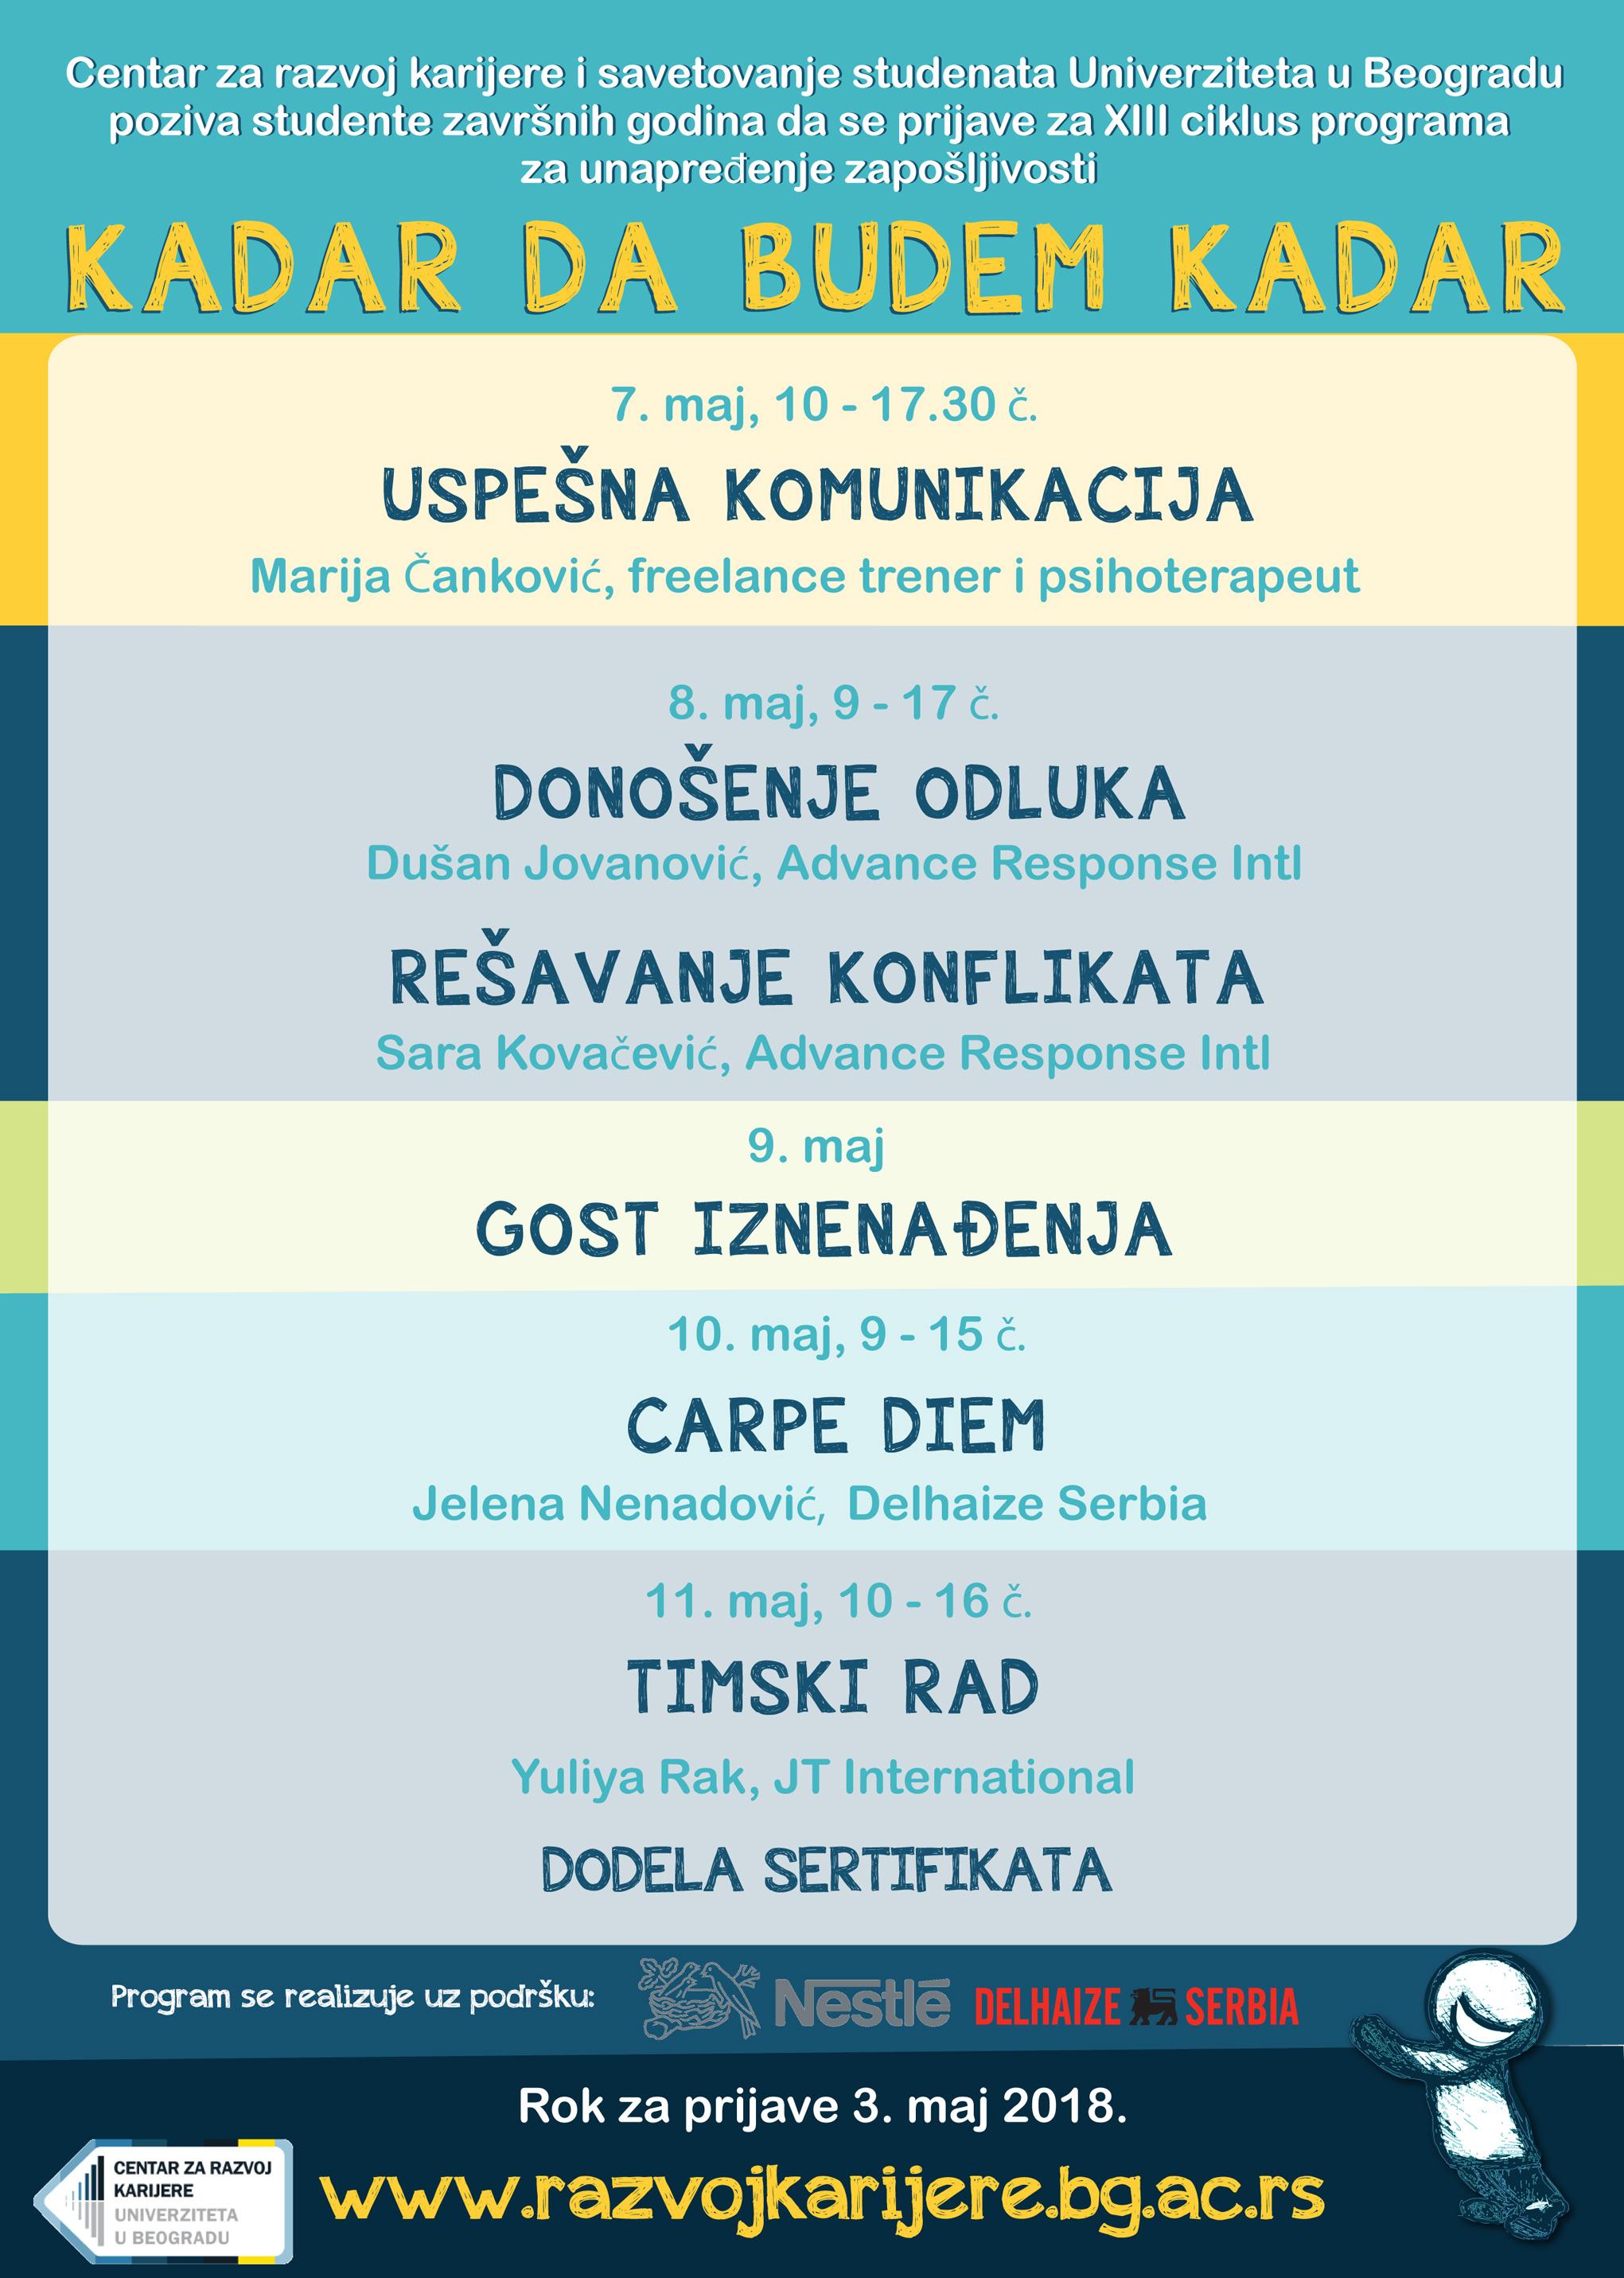 kdbk-plakat2018maj